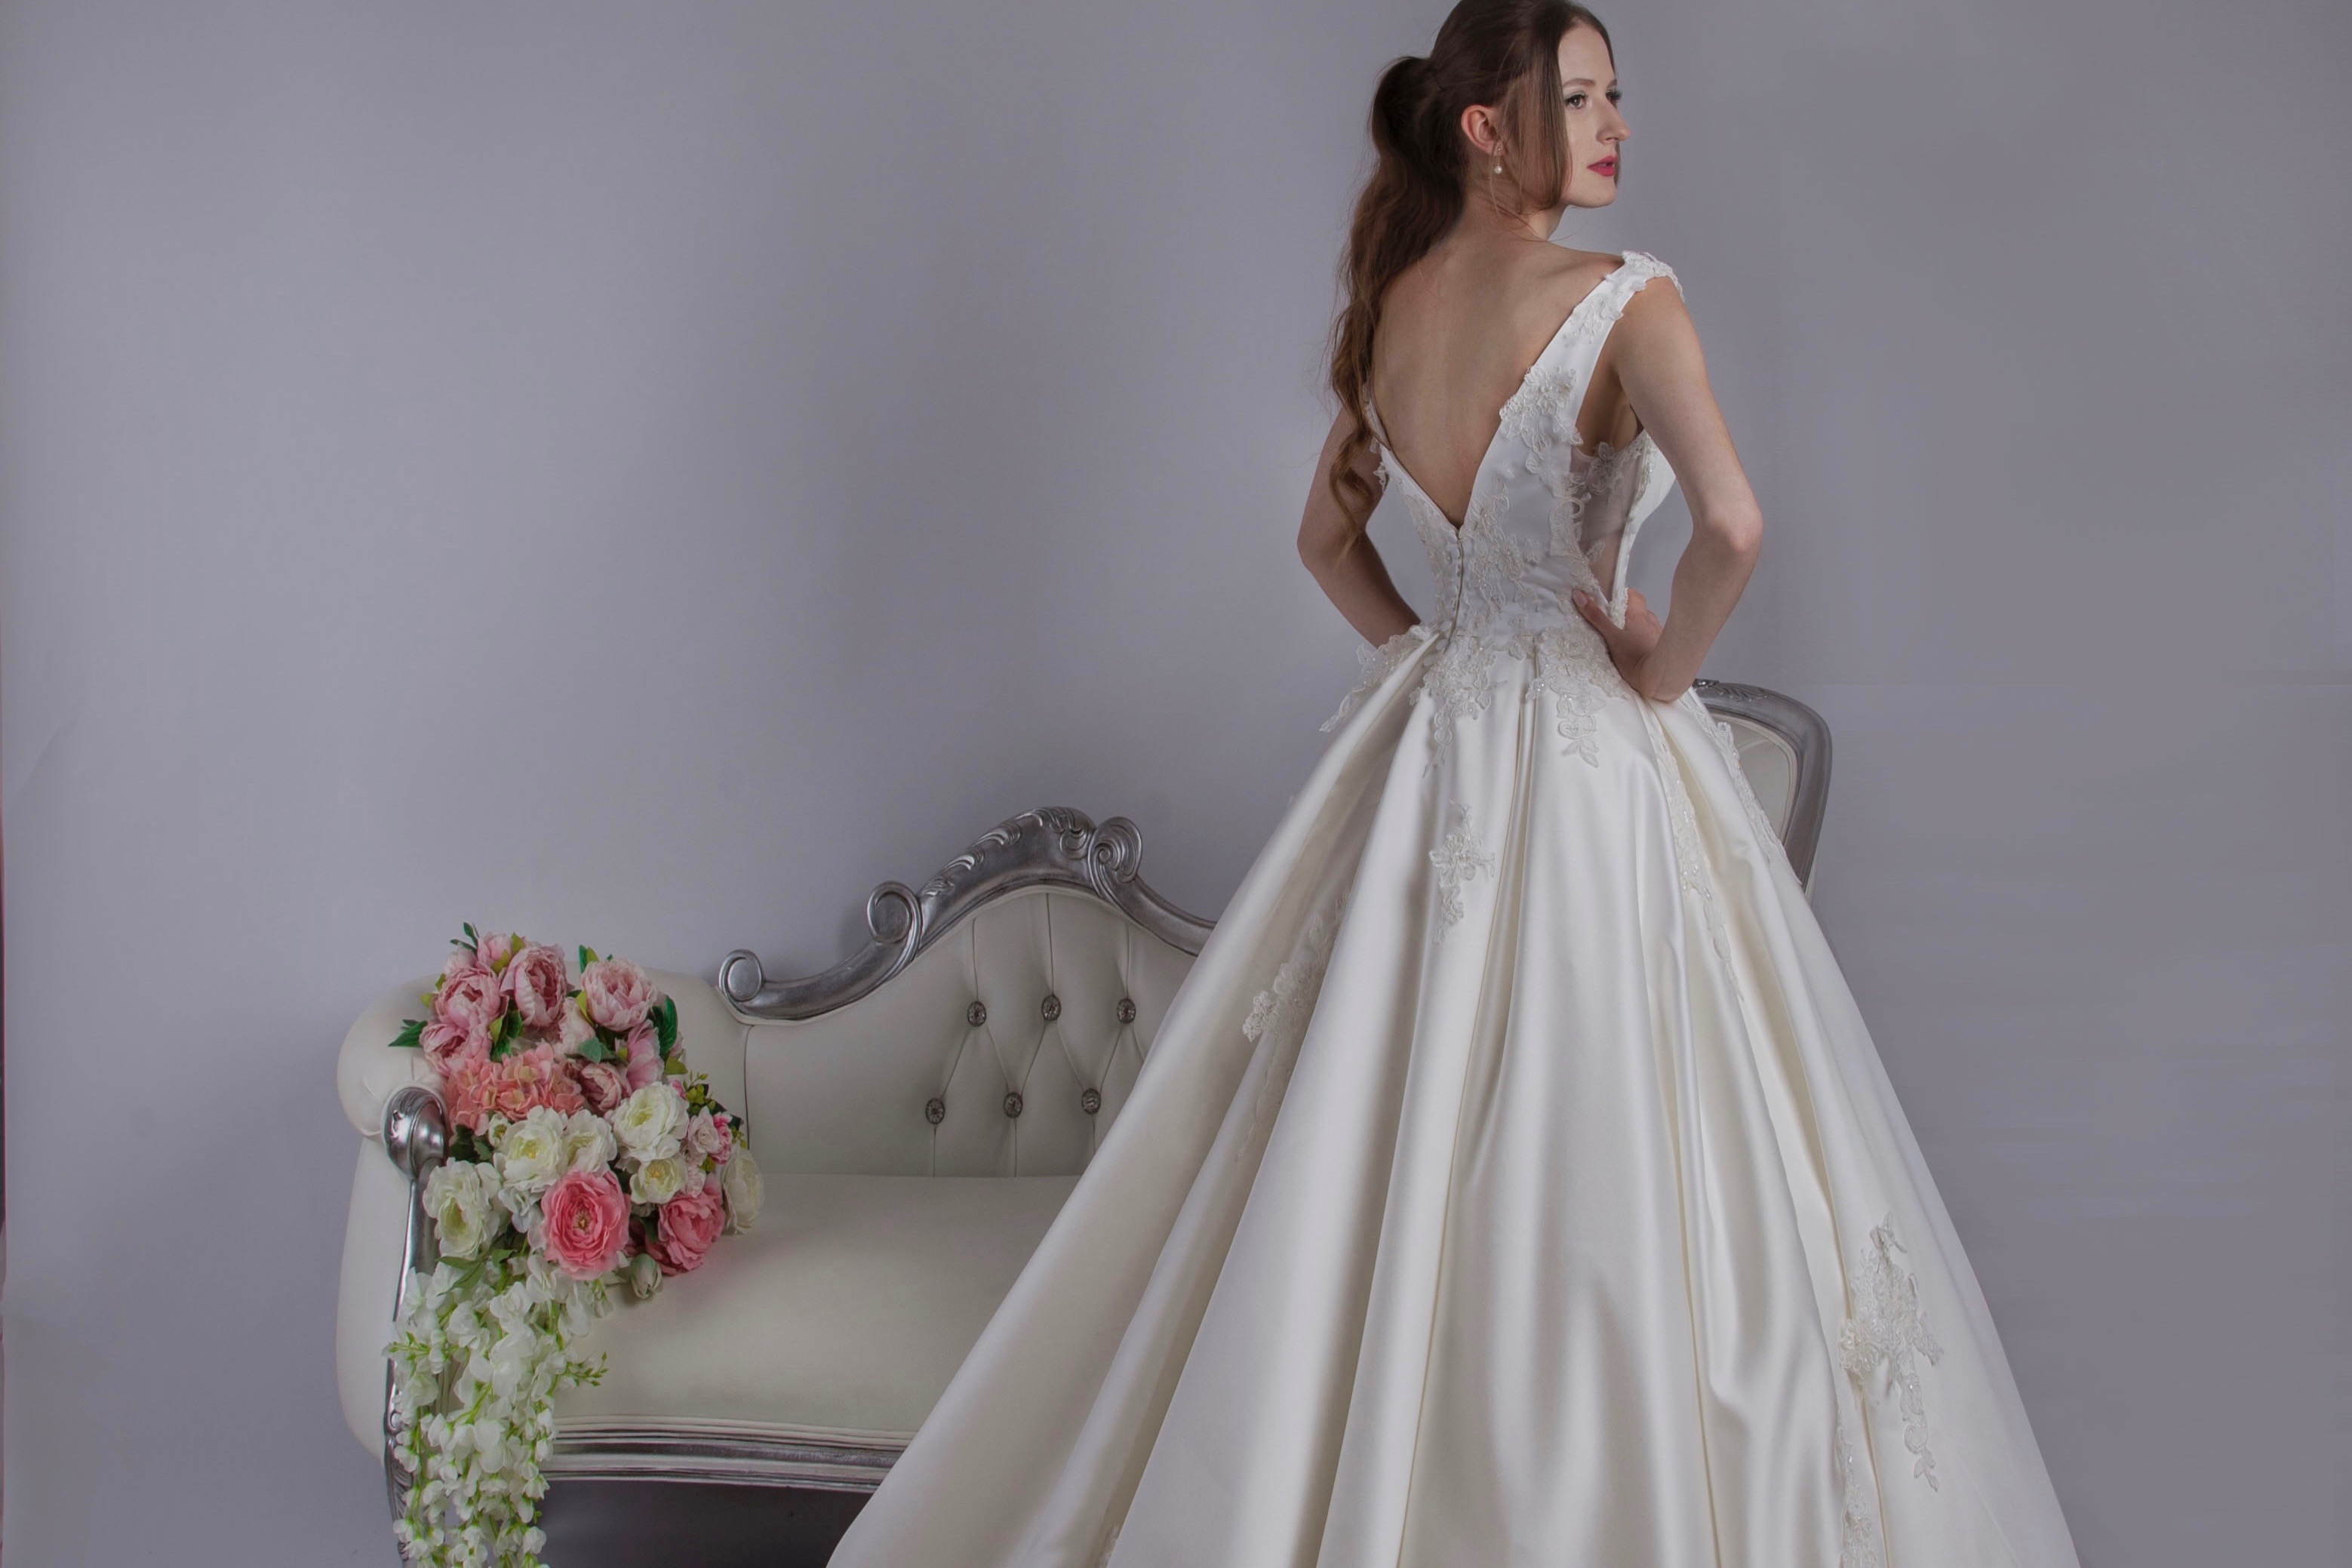 Robe de mariée princesse avec une grande traine et un dos nu